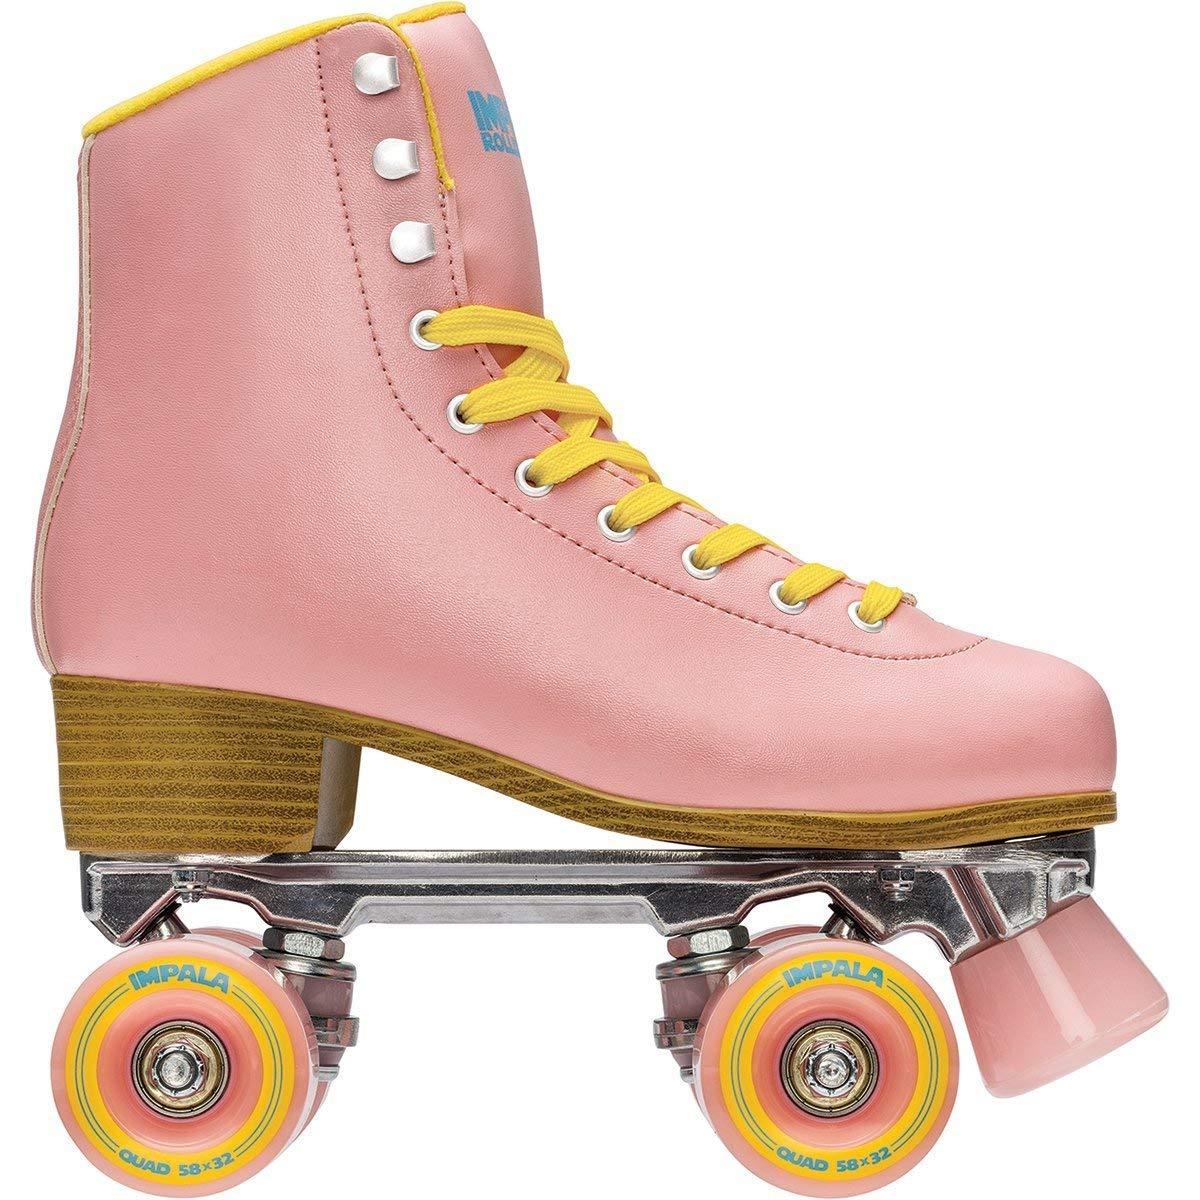 Impala Rollerskates Girl's Impala Quad Skate (Big Kid/Adult) Pink/Yellow 11 M